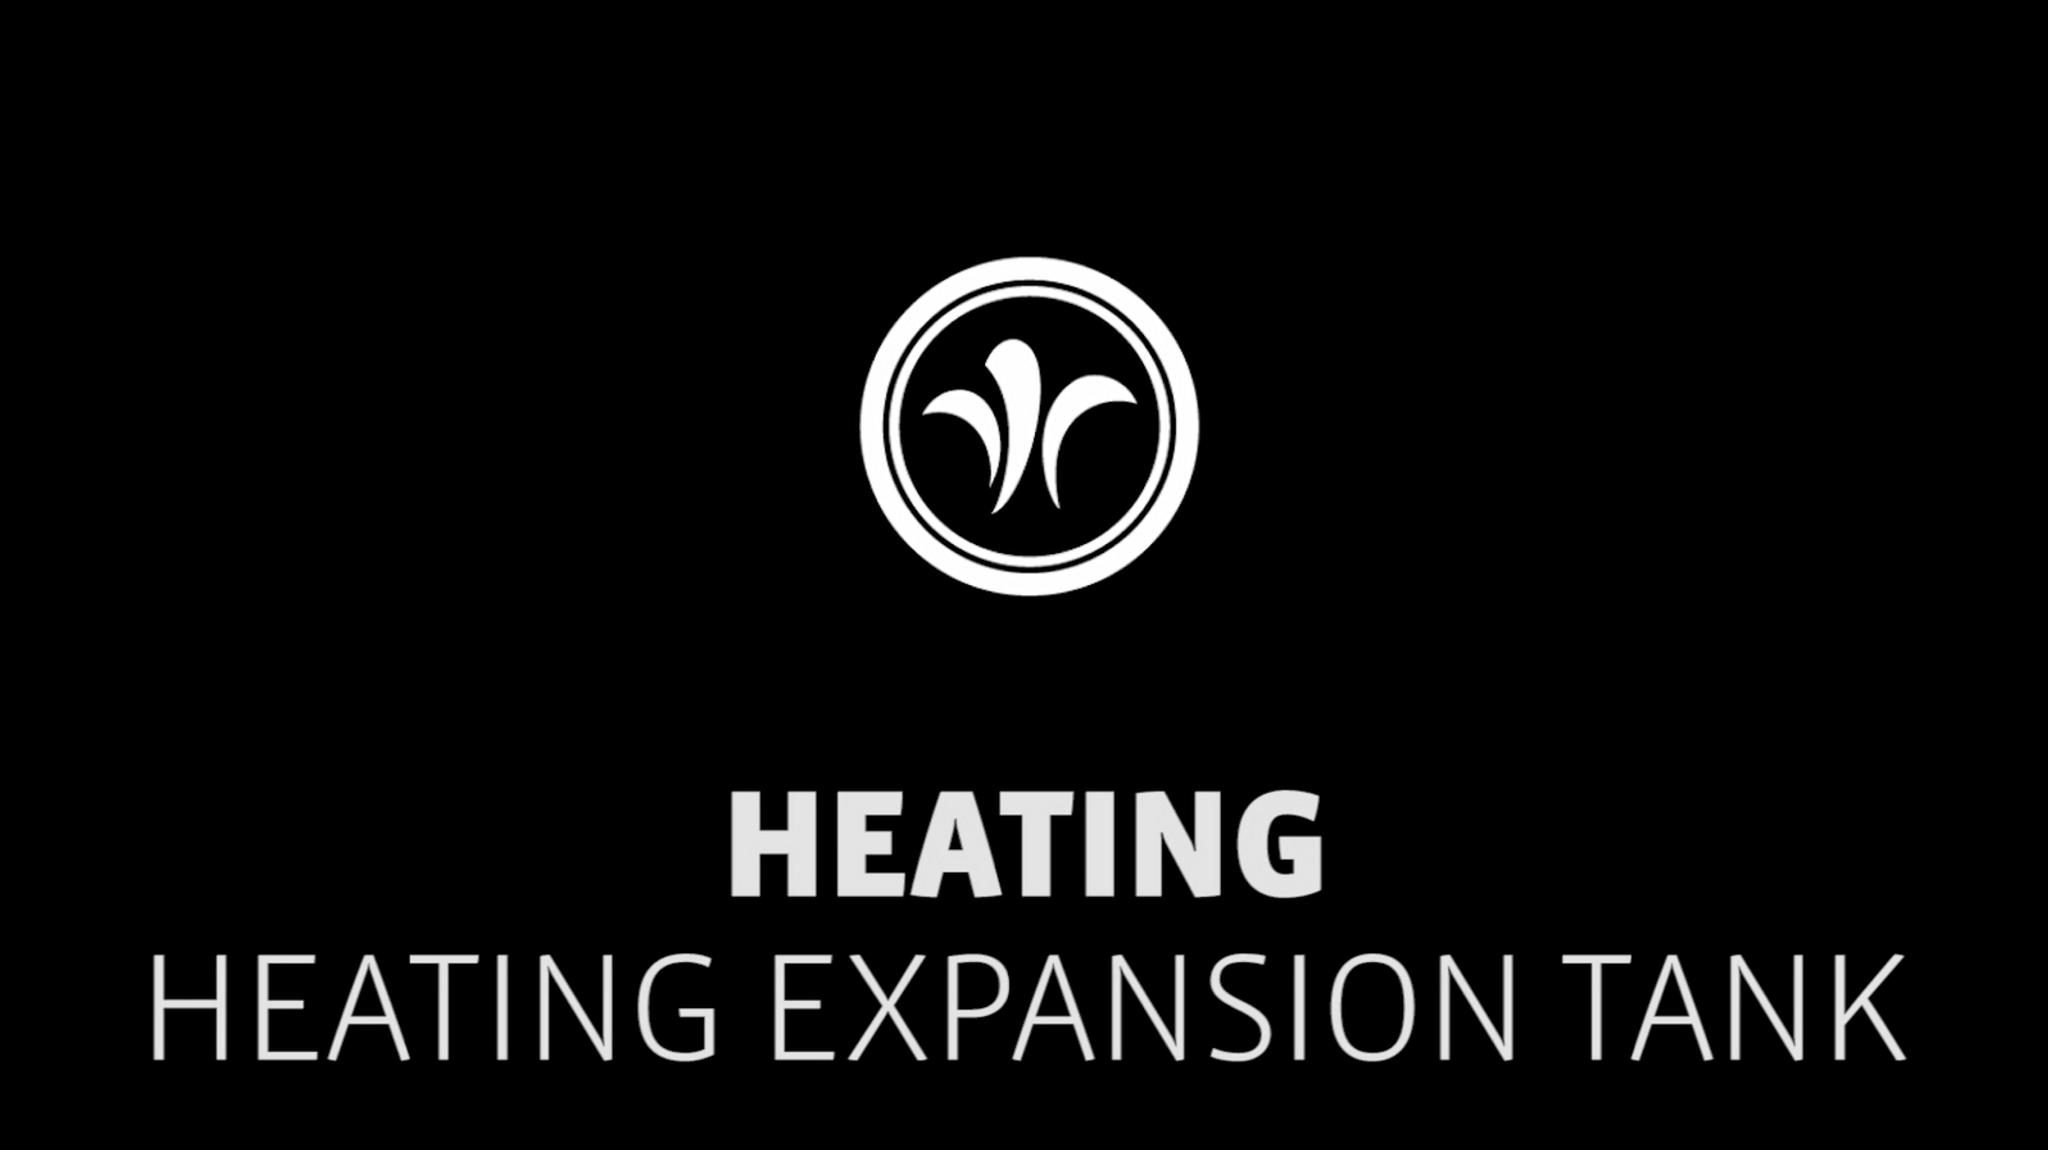 motorhome heating expansion tank // niesmann+bischoff - camper (model ARTO) // 2019 // H3